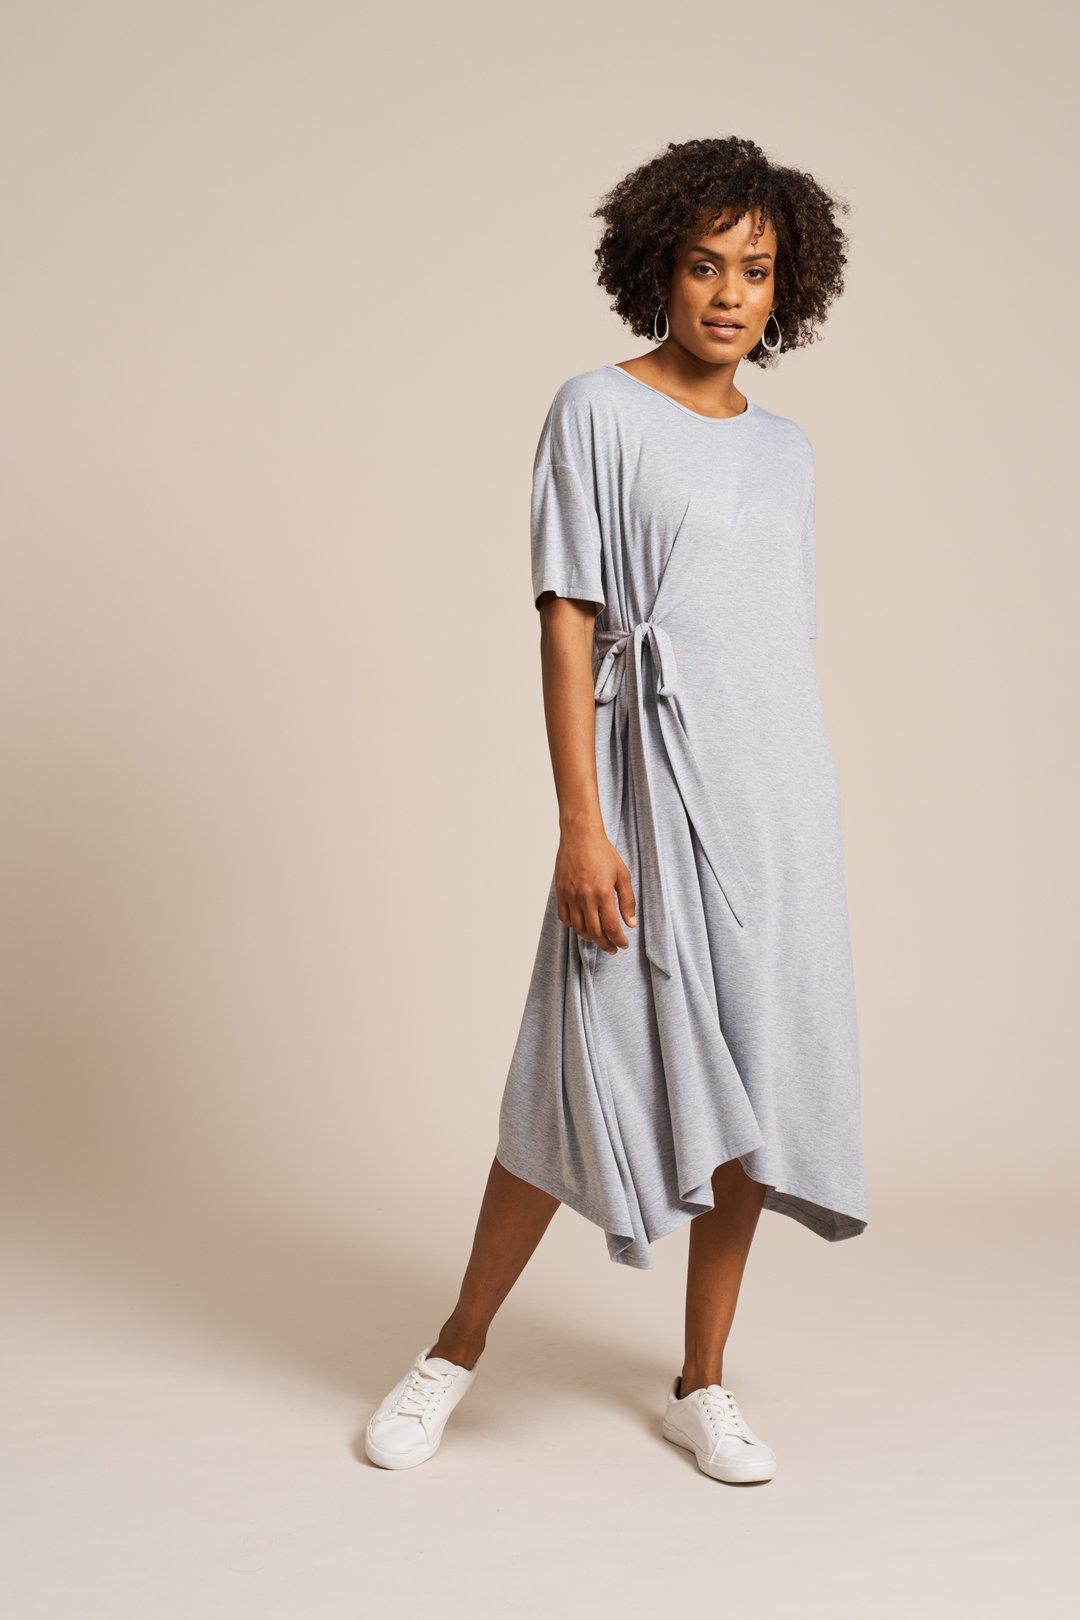 SALE Eb&Ive Oprah Dress - Grey Marle WAS £55